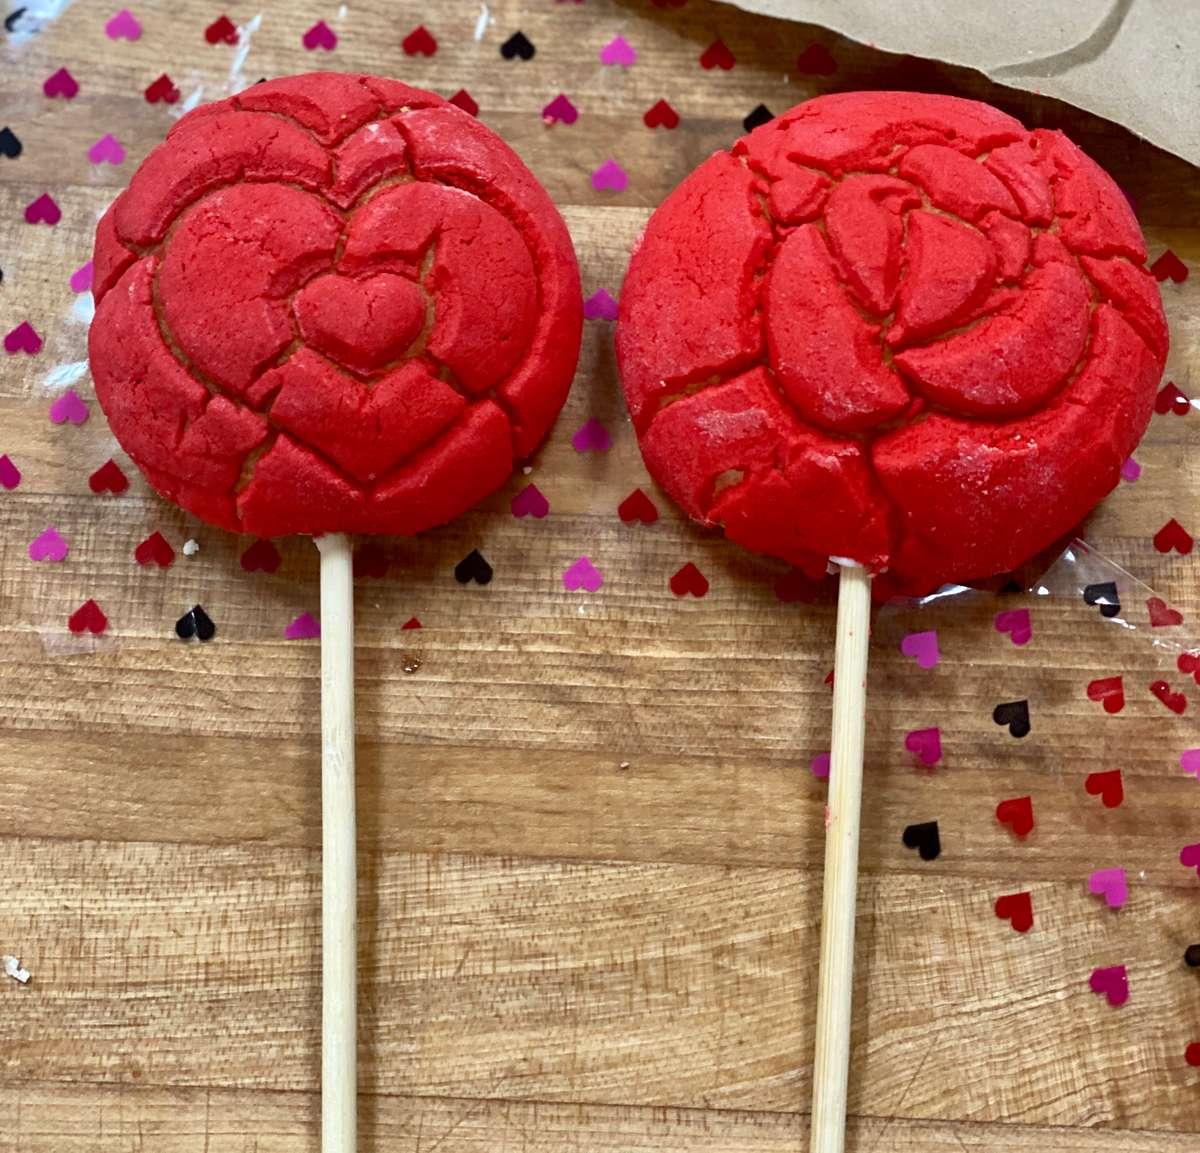 Mini conchas hear and rose shaped